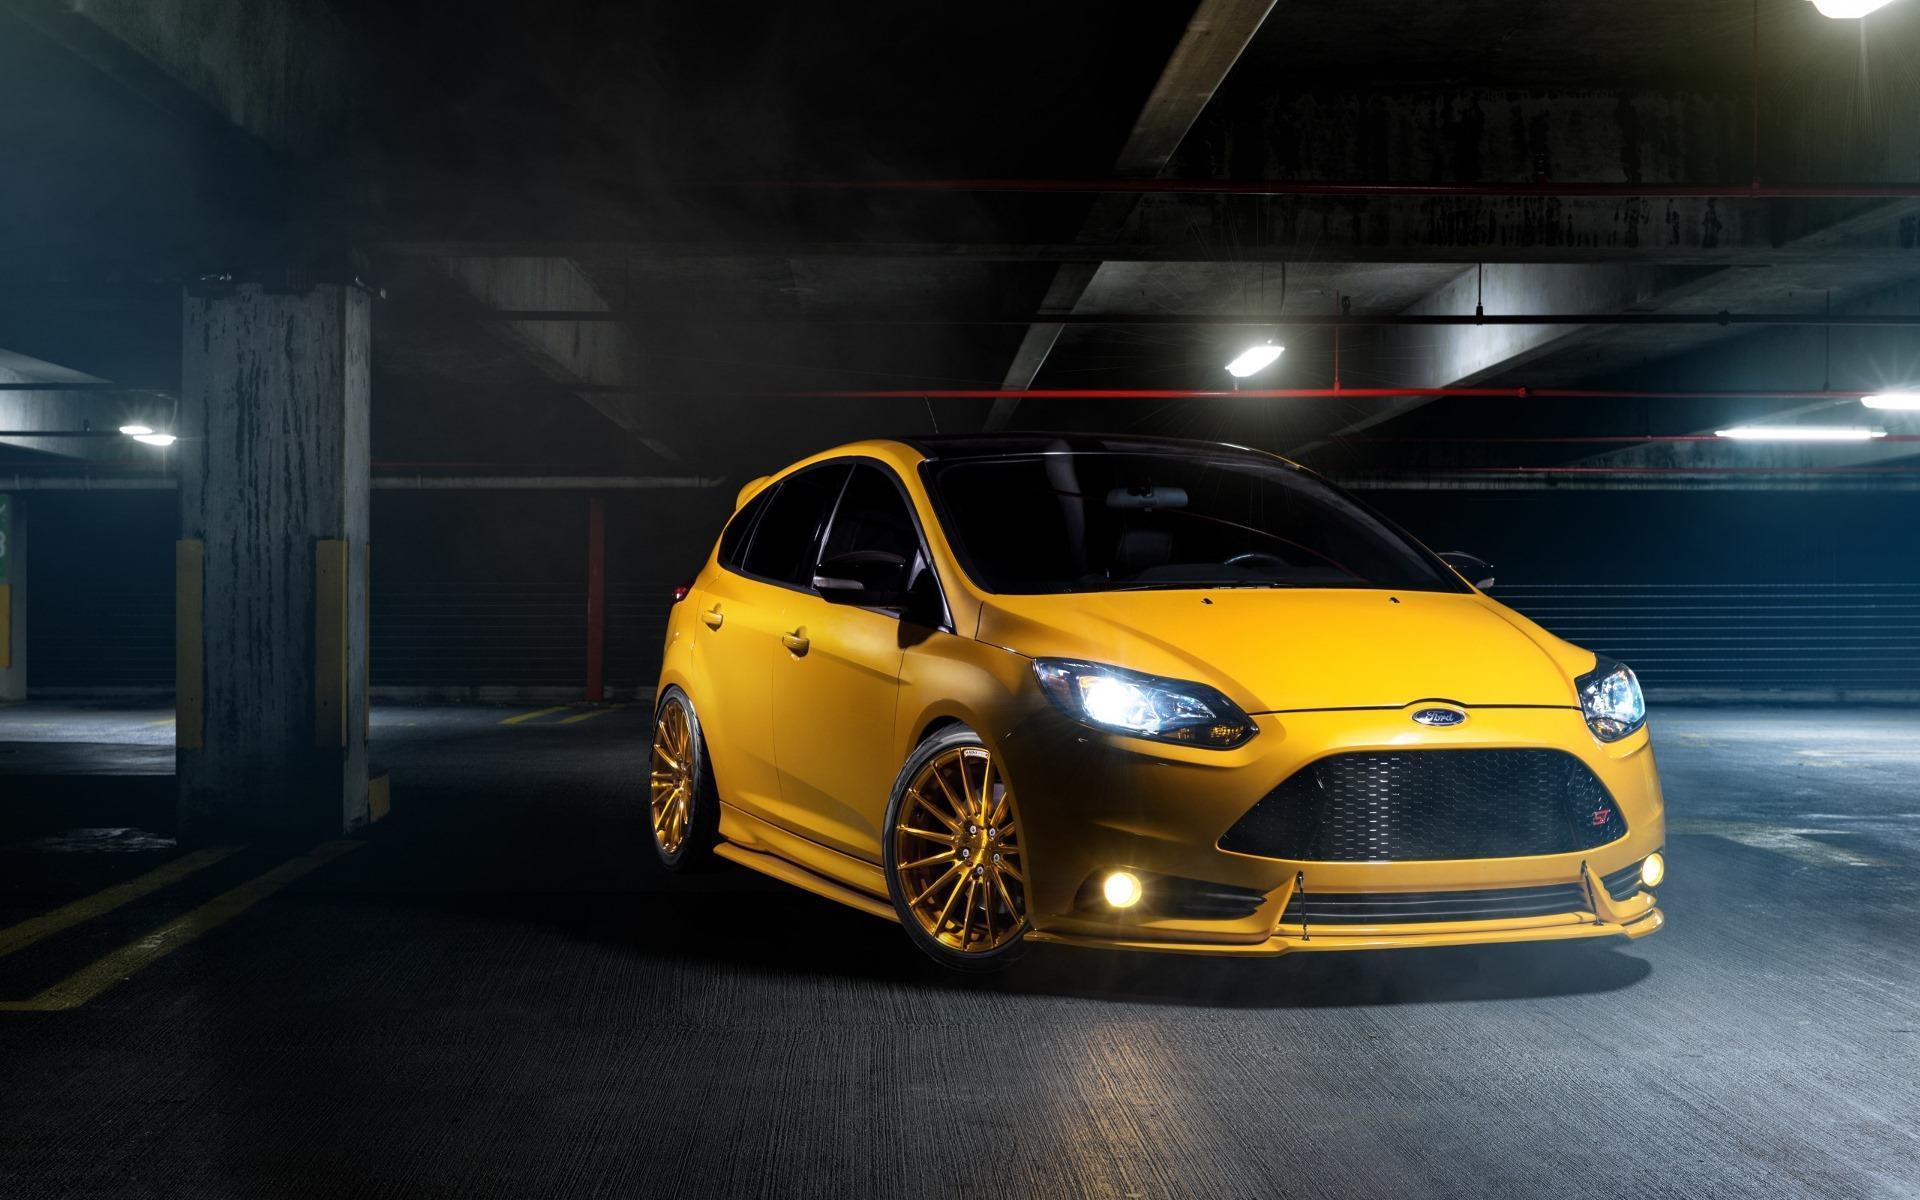 ford_special-car-wallpaper-HD_2